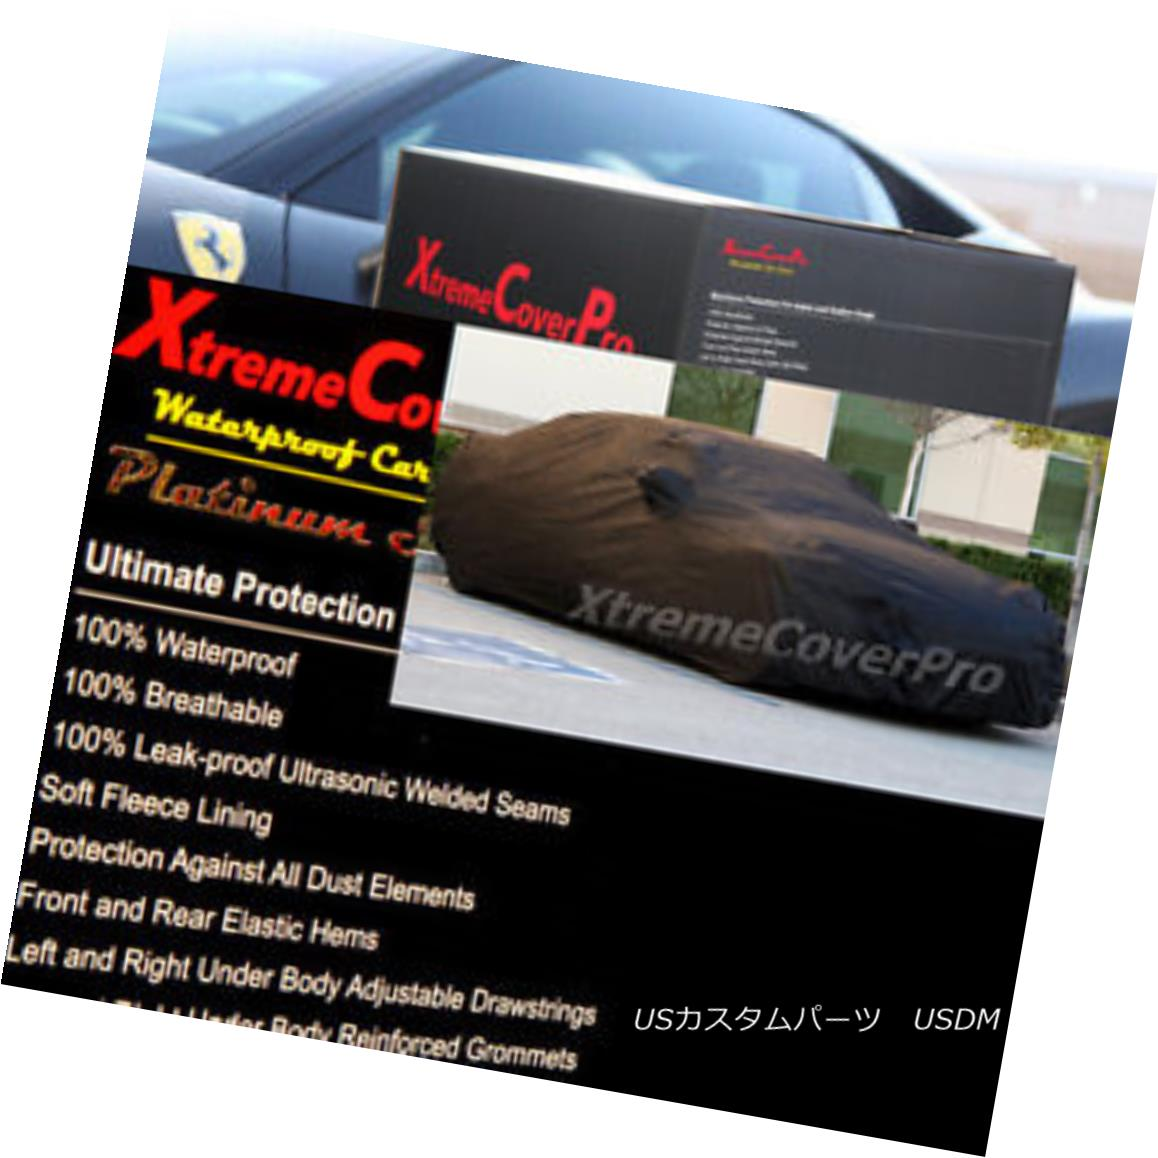 Car Waterproof カーカバー MirrorPocketを搭載した2011年のドッジ・アベンジャー防水カーカバー 2012 2011 Dodge Avenger Cover w/MirrorPocket